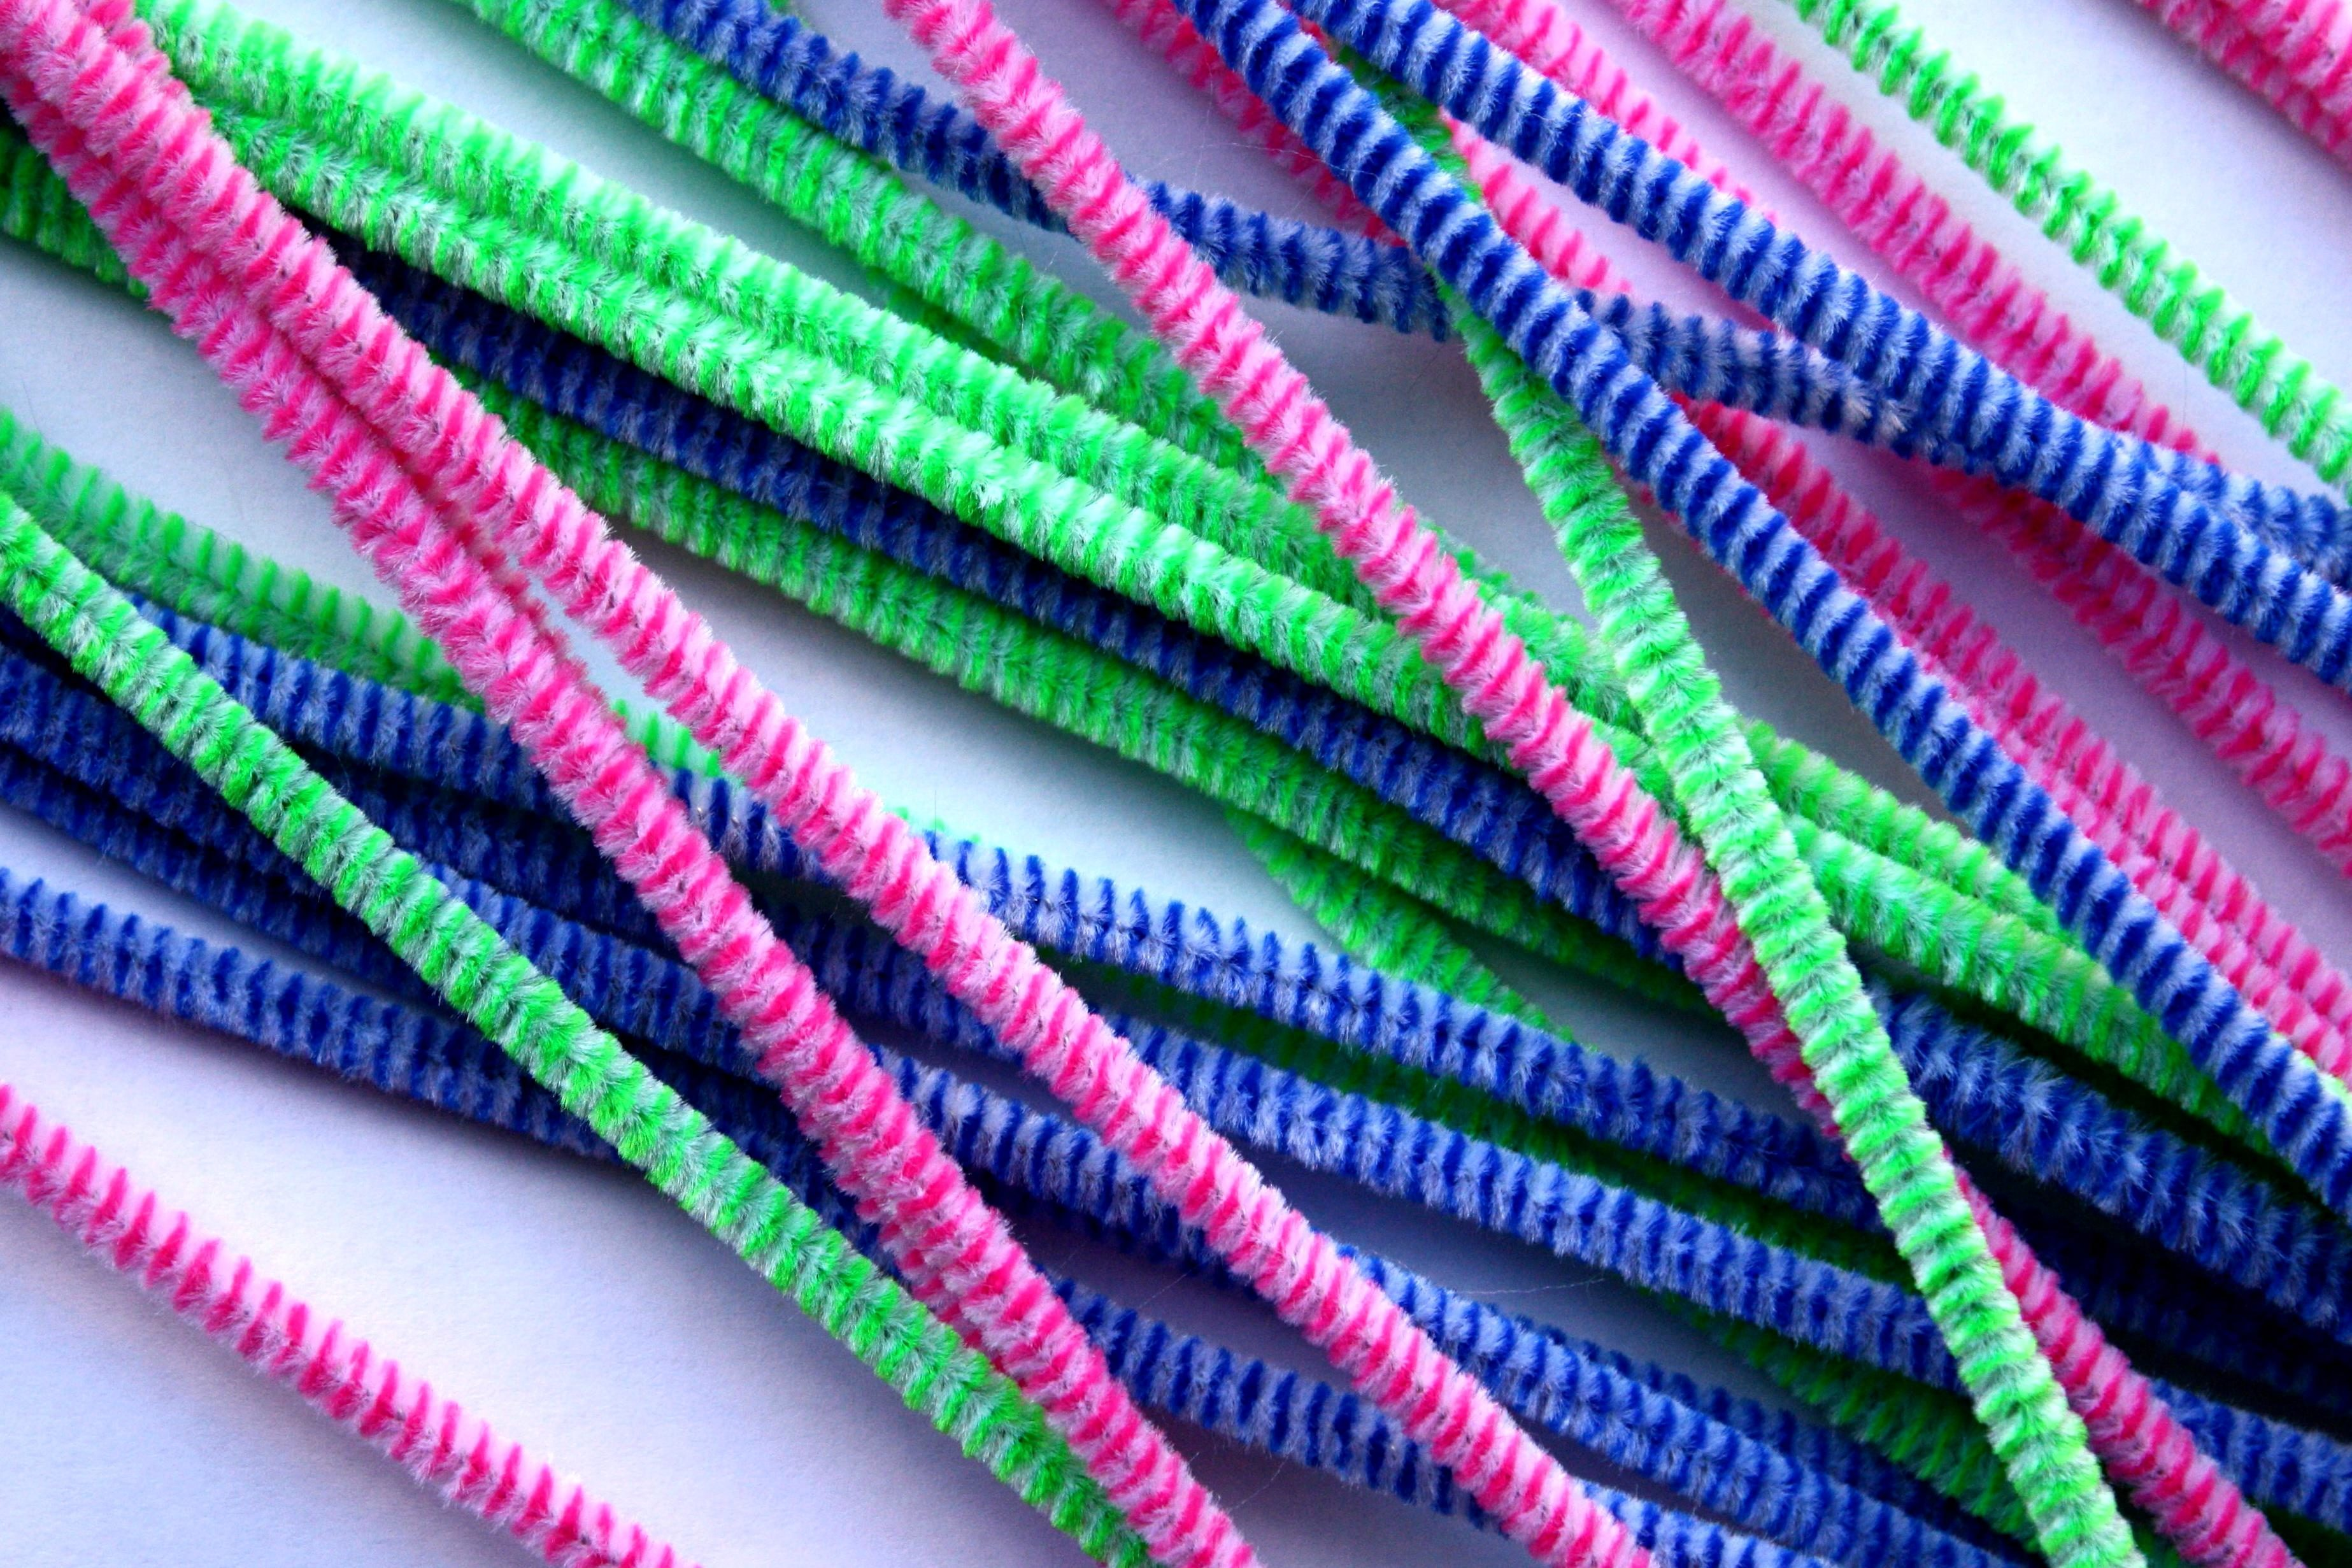 Foto gratis colorati tubi di plastica for Tipi di tubi di plastica